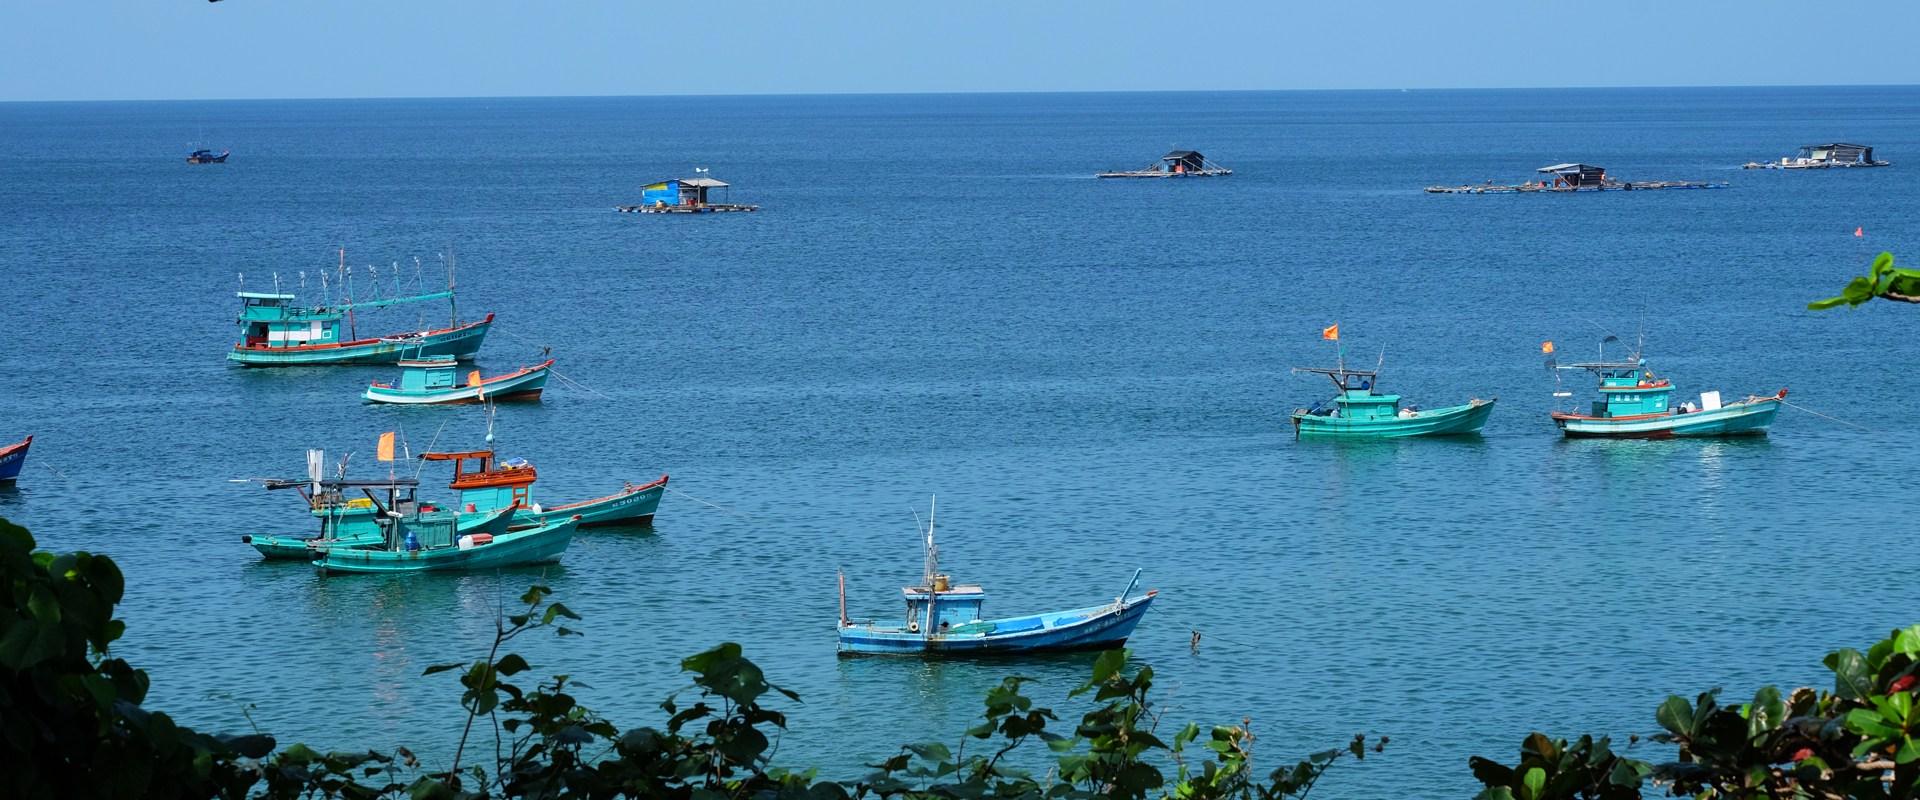 Phu-Quoc-Island-Vietnam